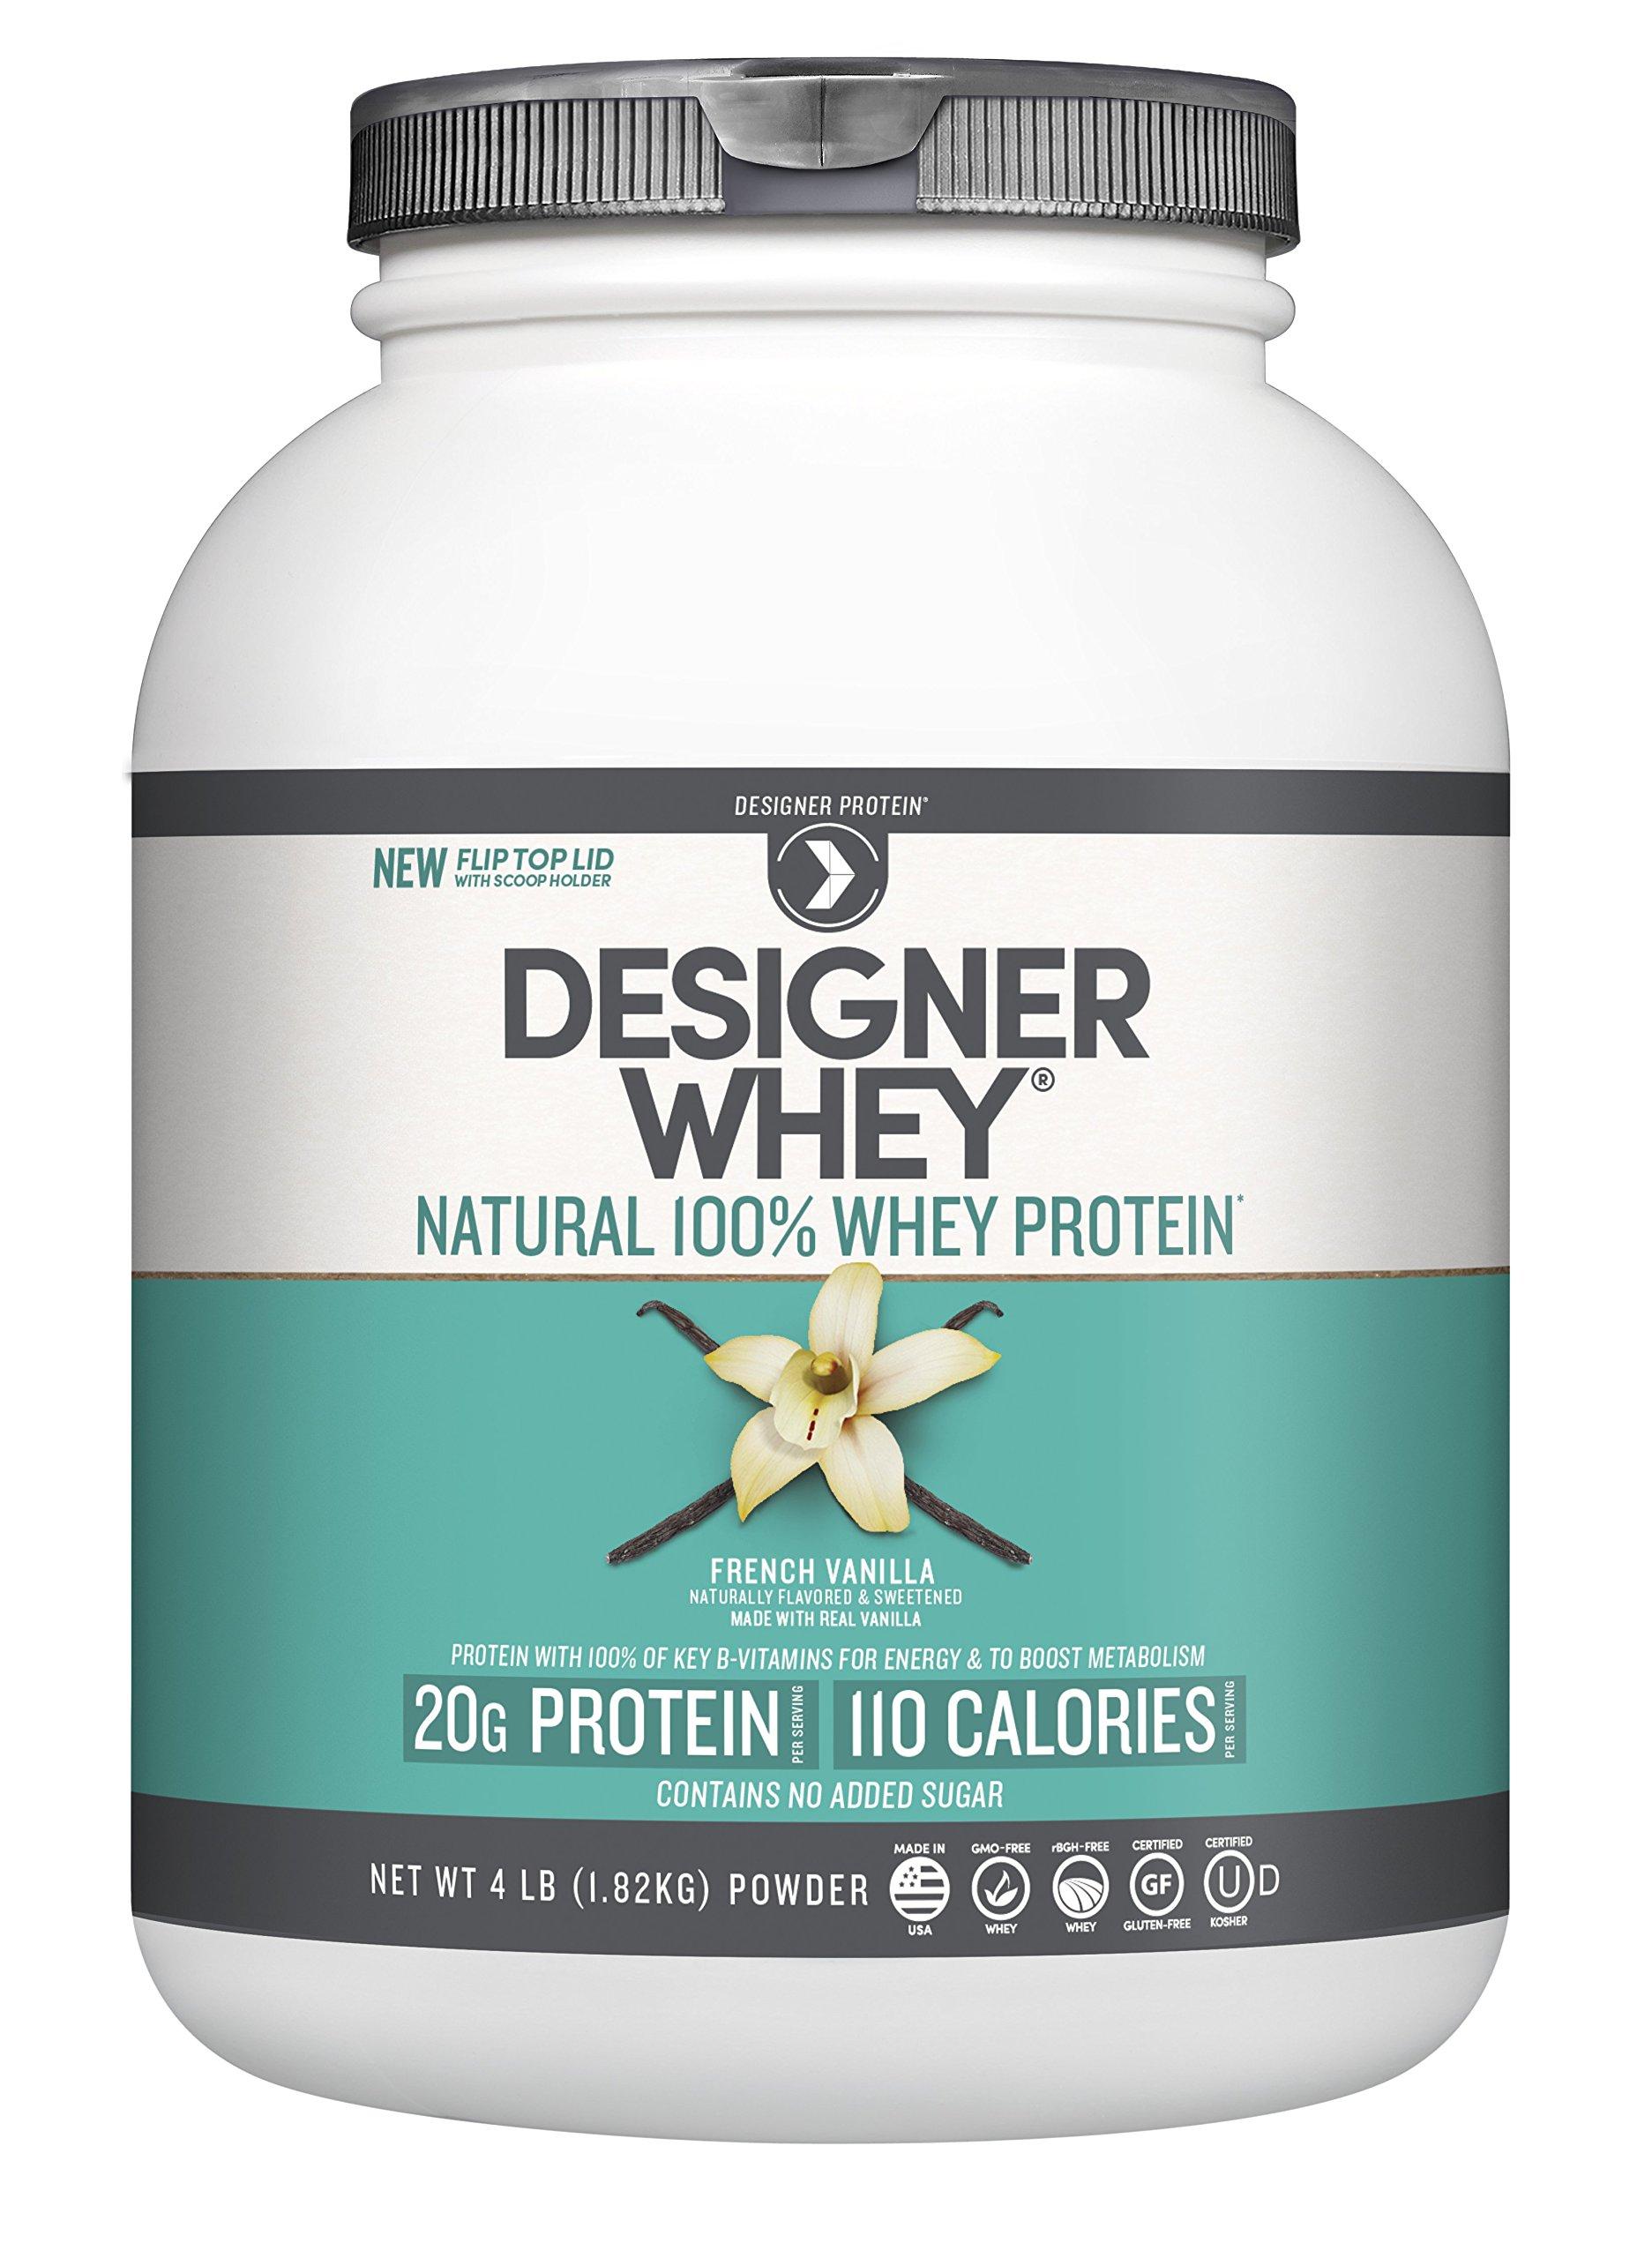 Designer Whey Premium Natural 100% Whey Protein, French Vanilla, 4 Pound by Designer Whey (Image #4)